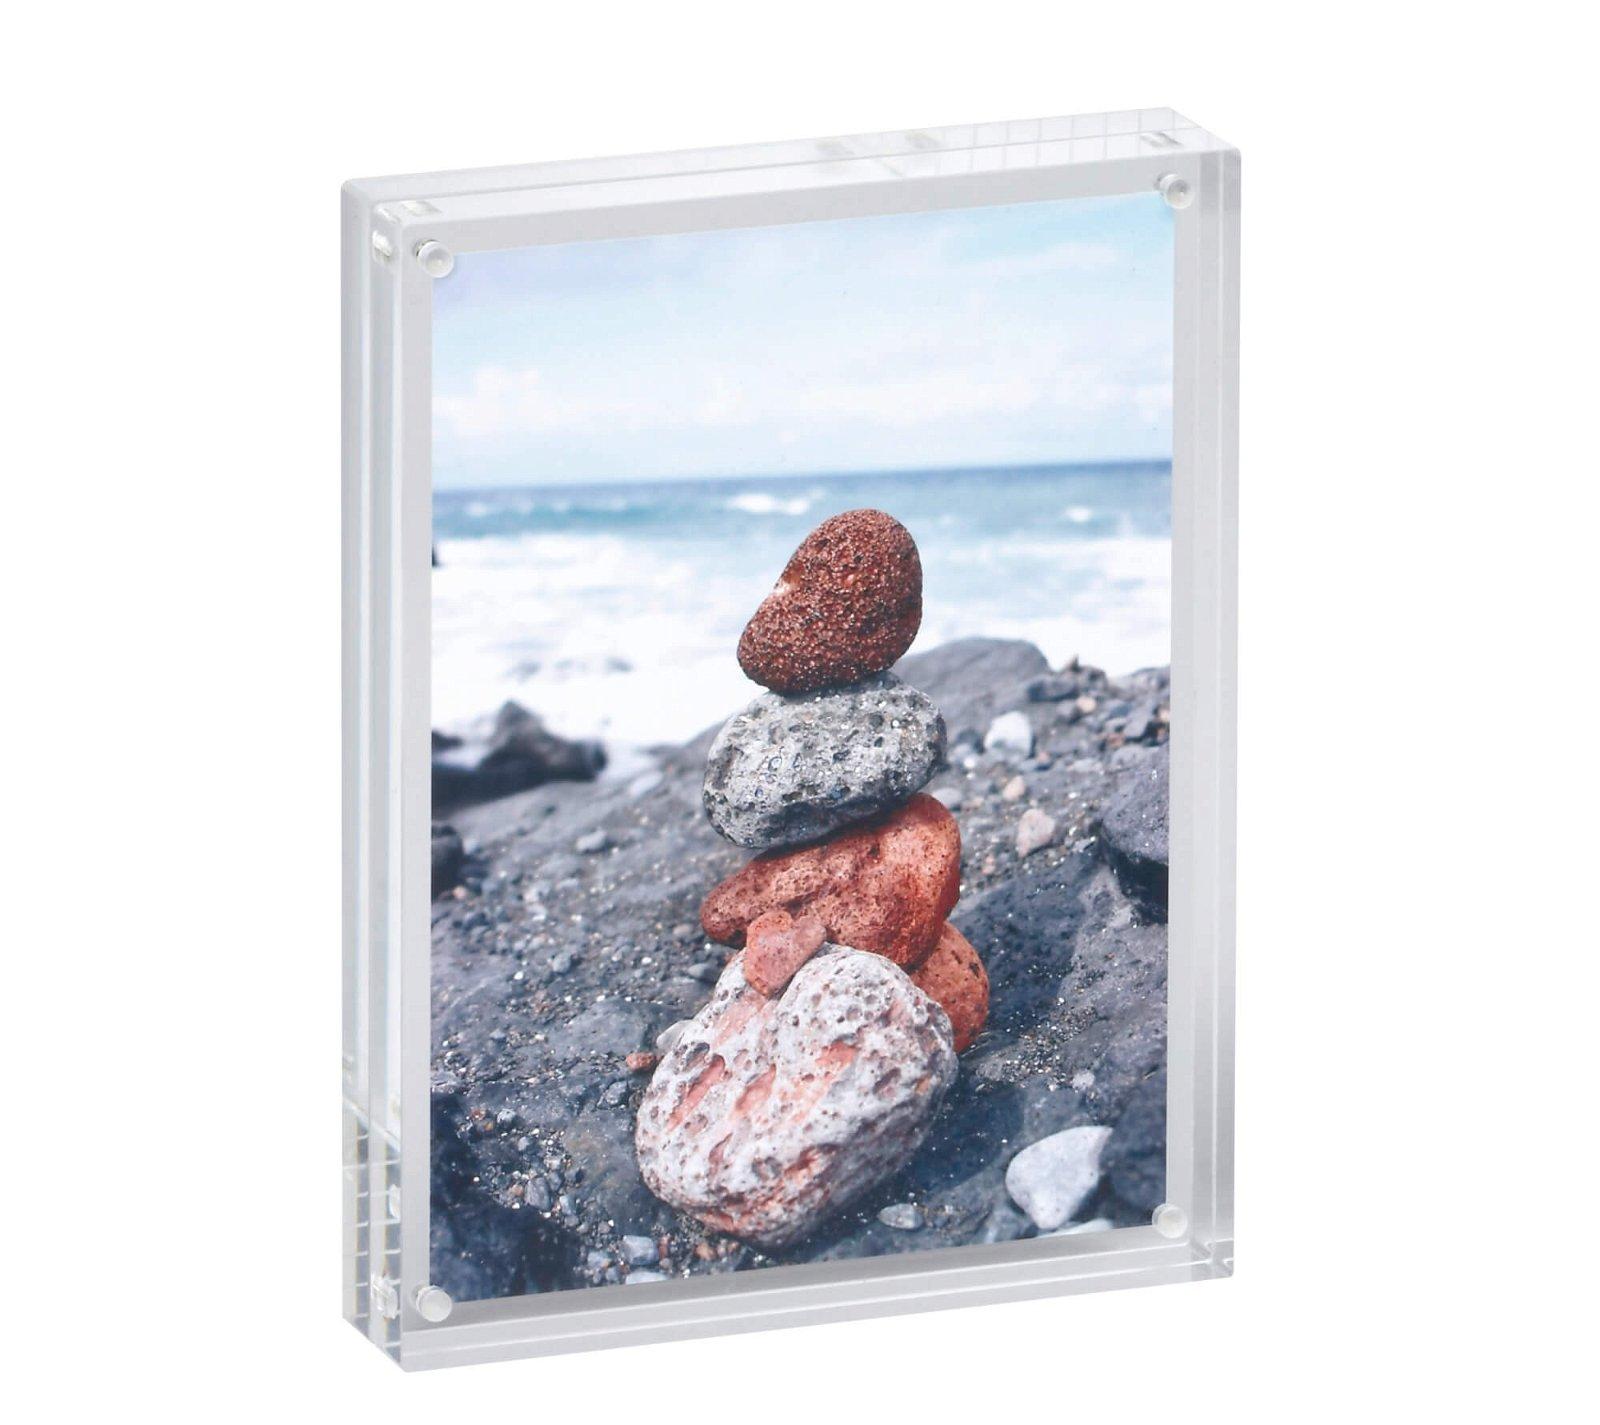 Acryl-Bilderhalter, 15 x 11,5 x 2,4 cm, glasklar